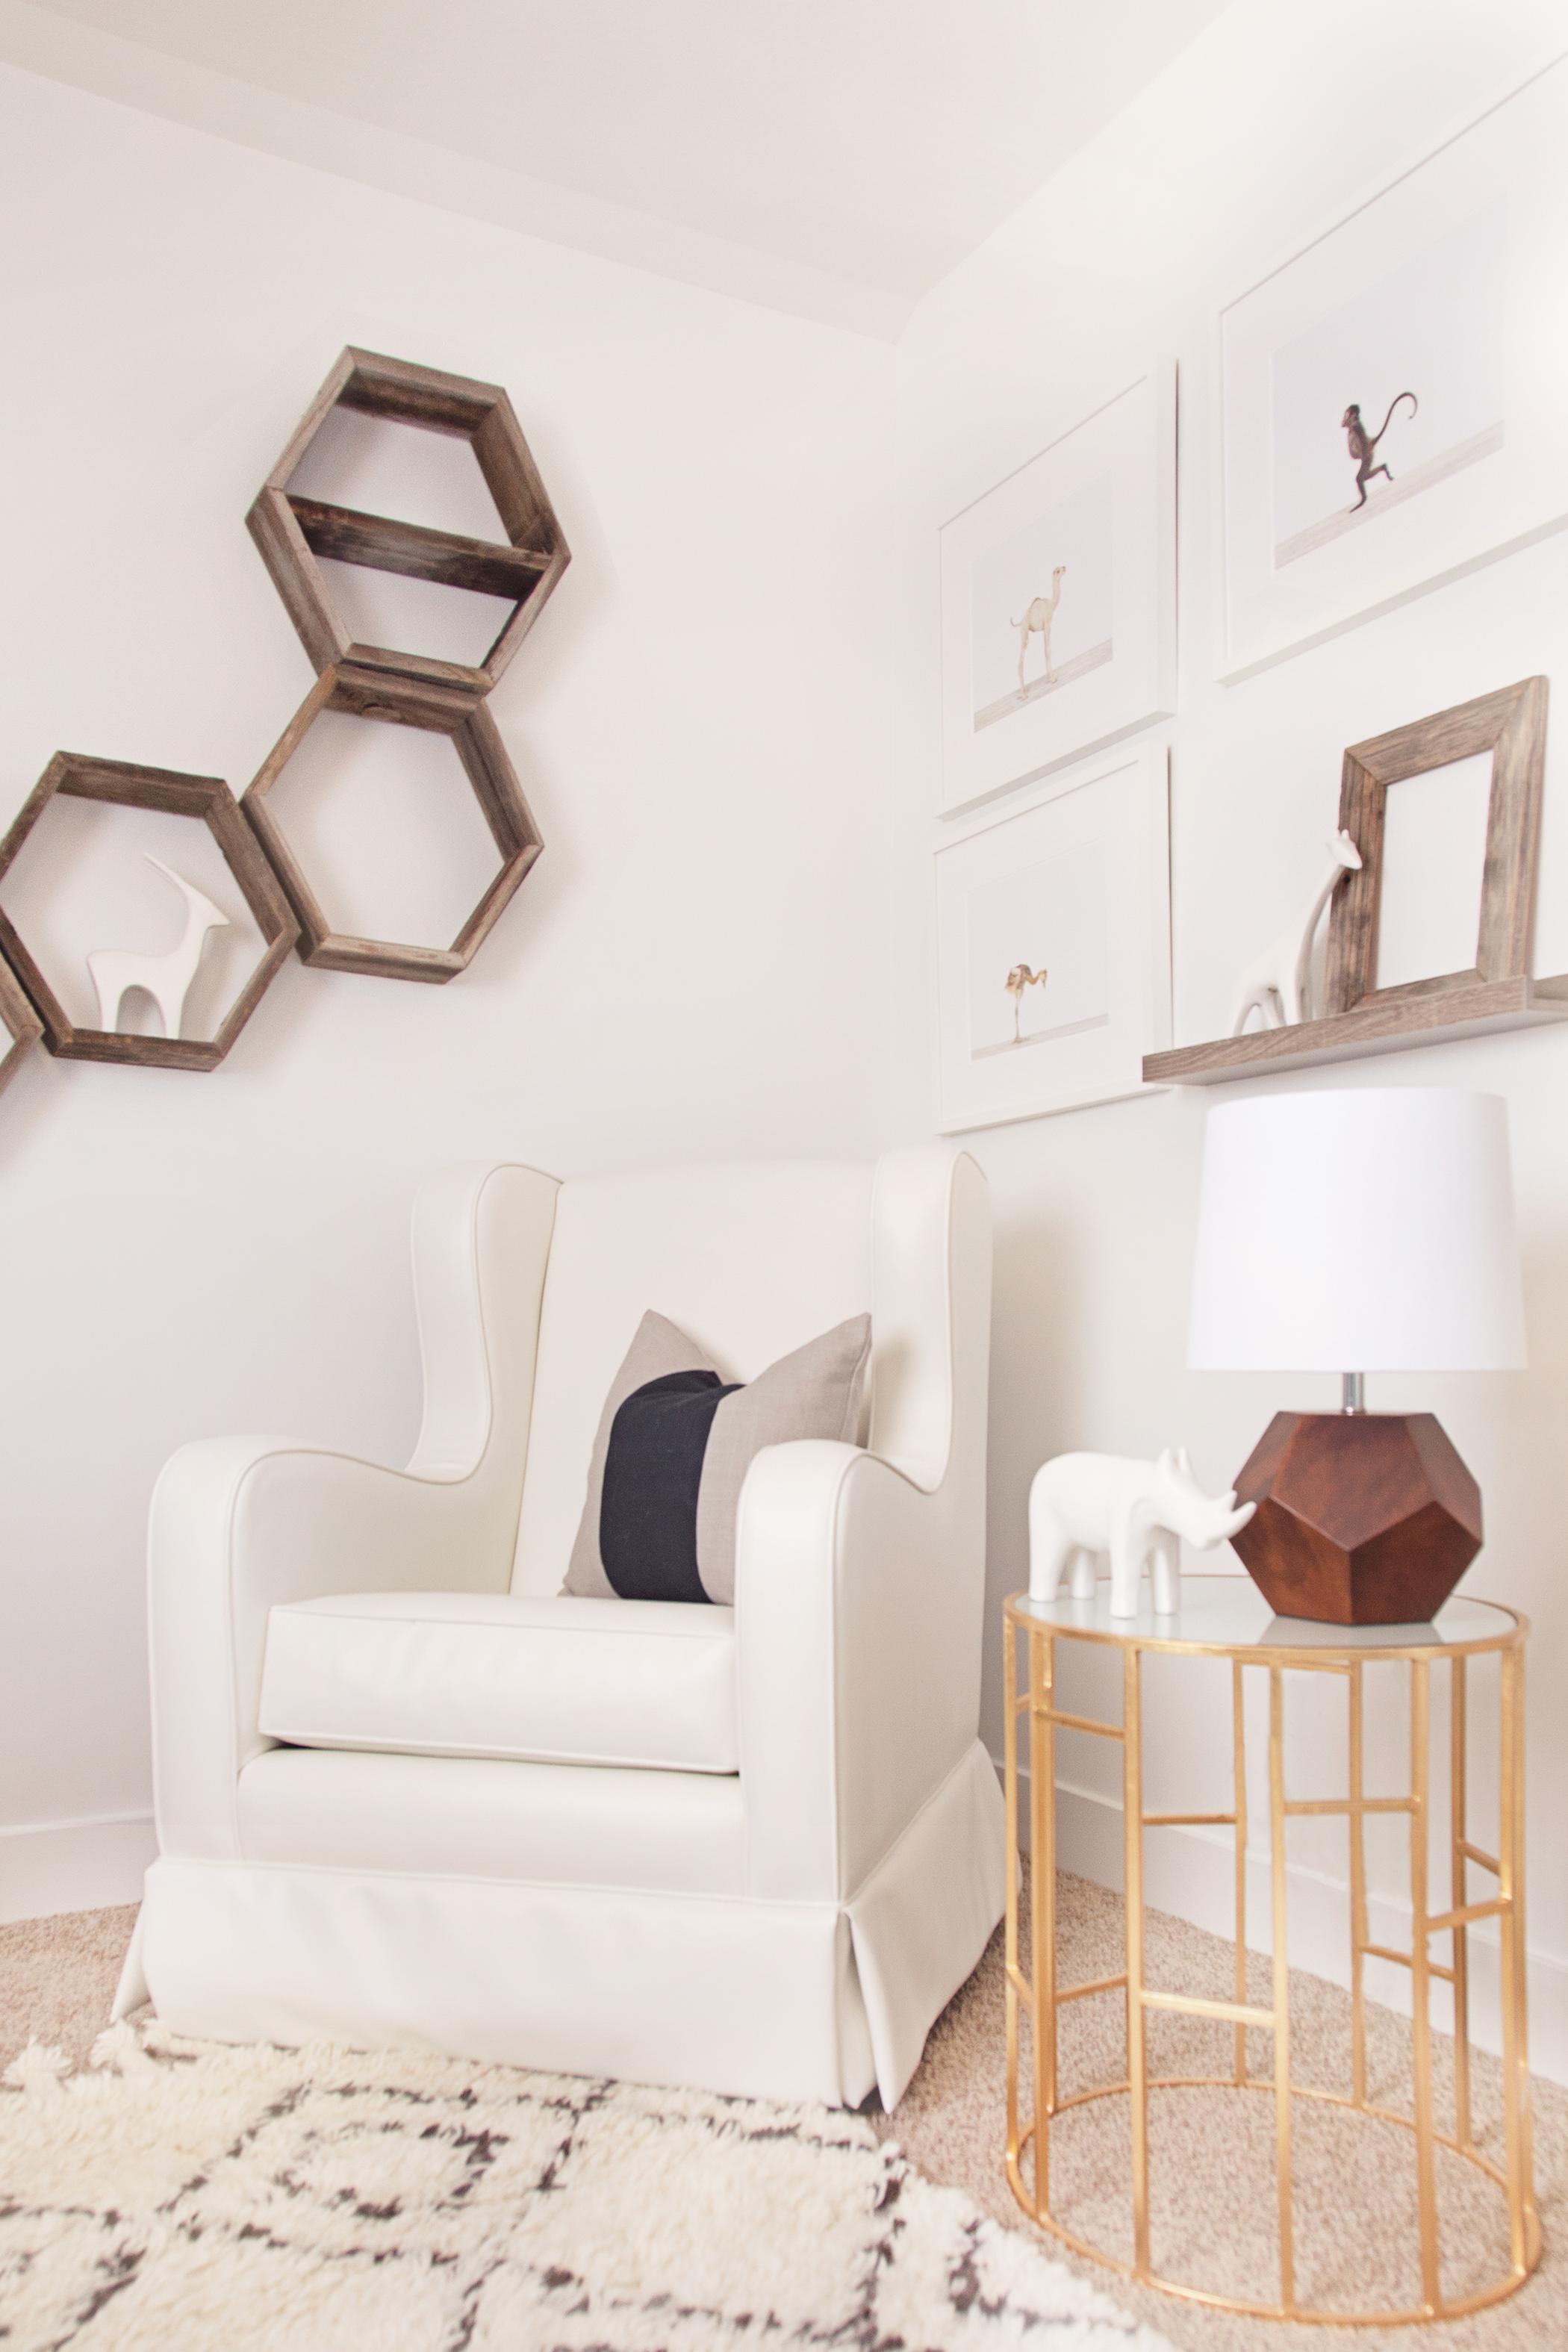 Glider and Hexagon Shelves